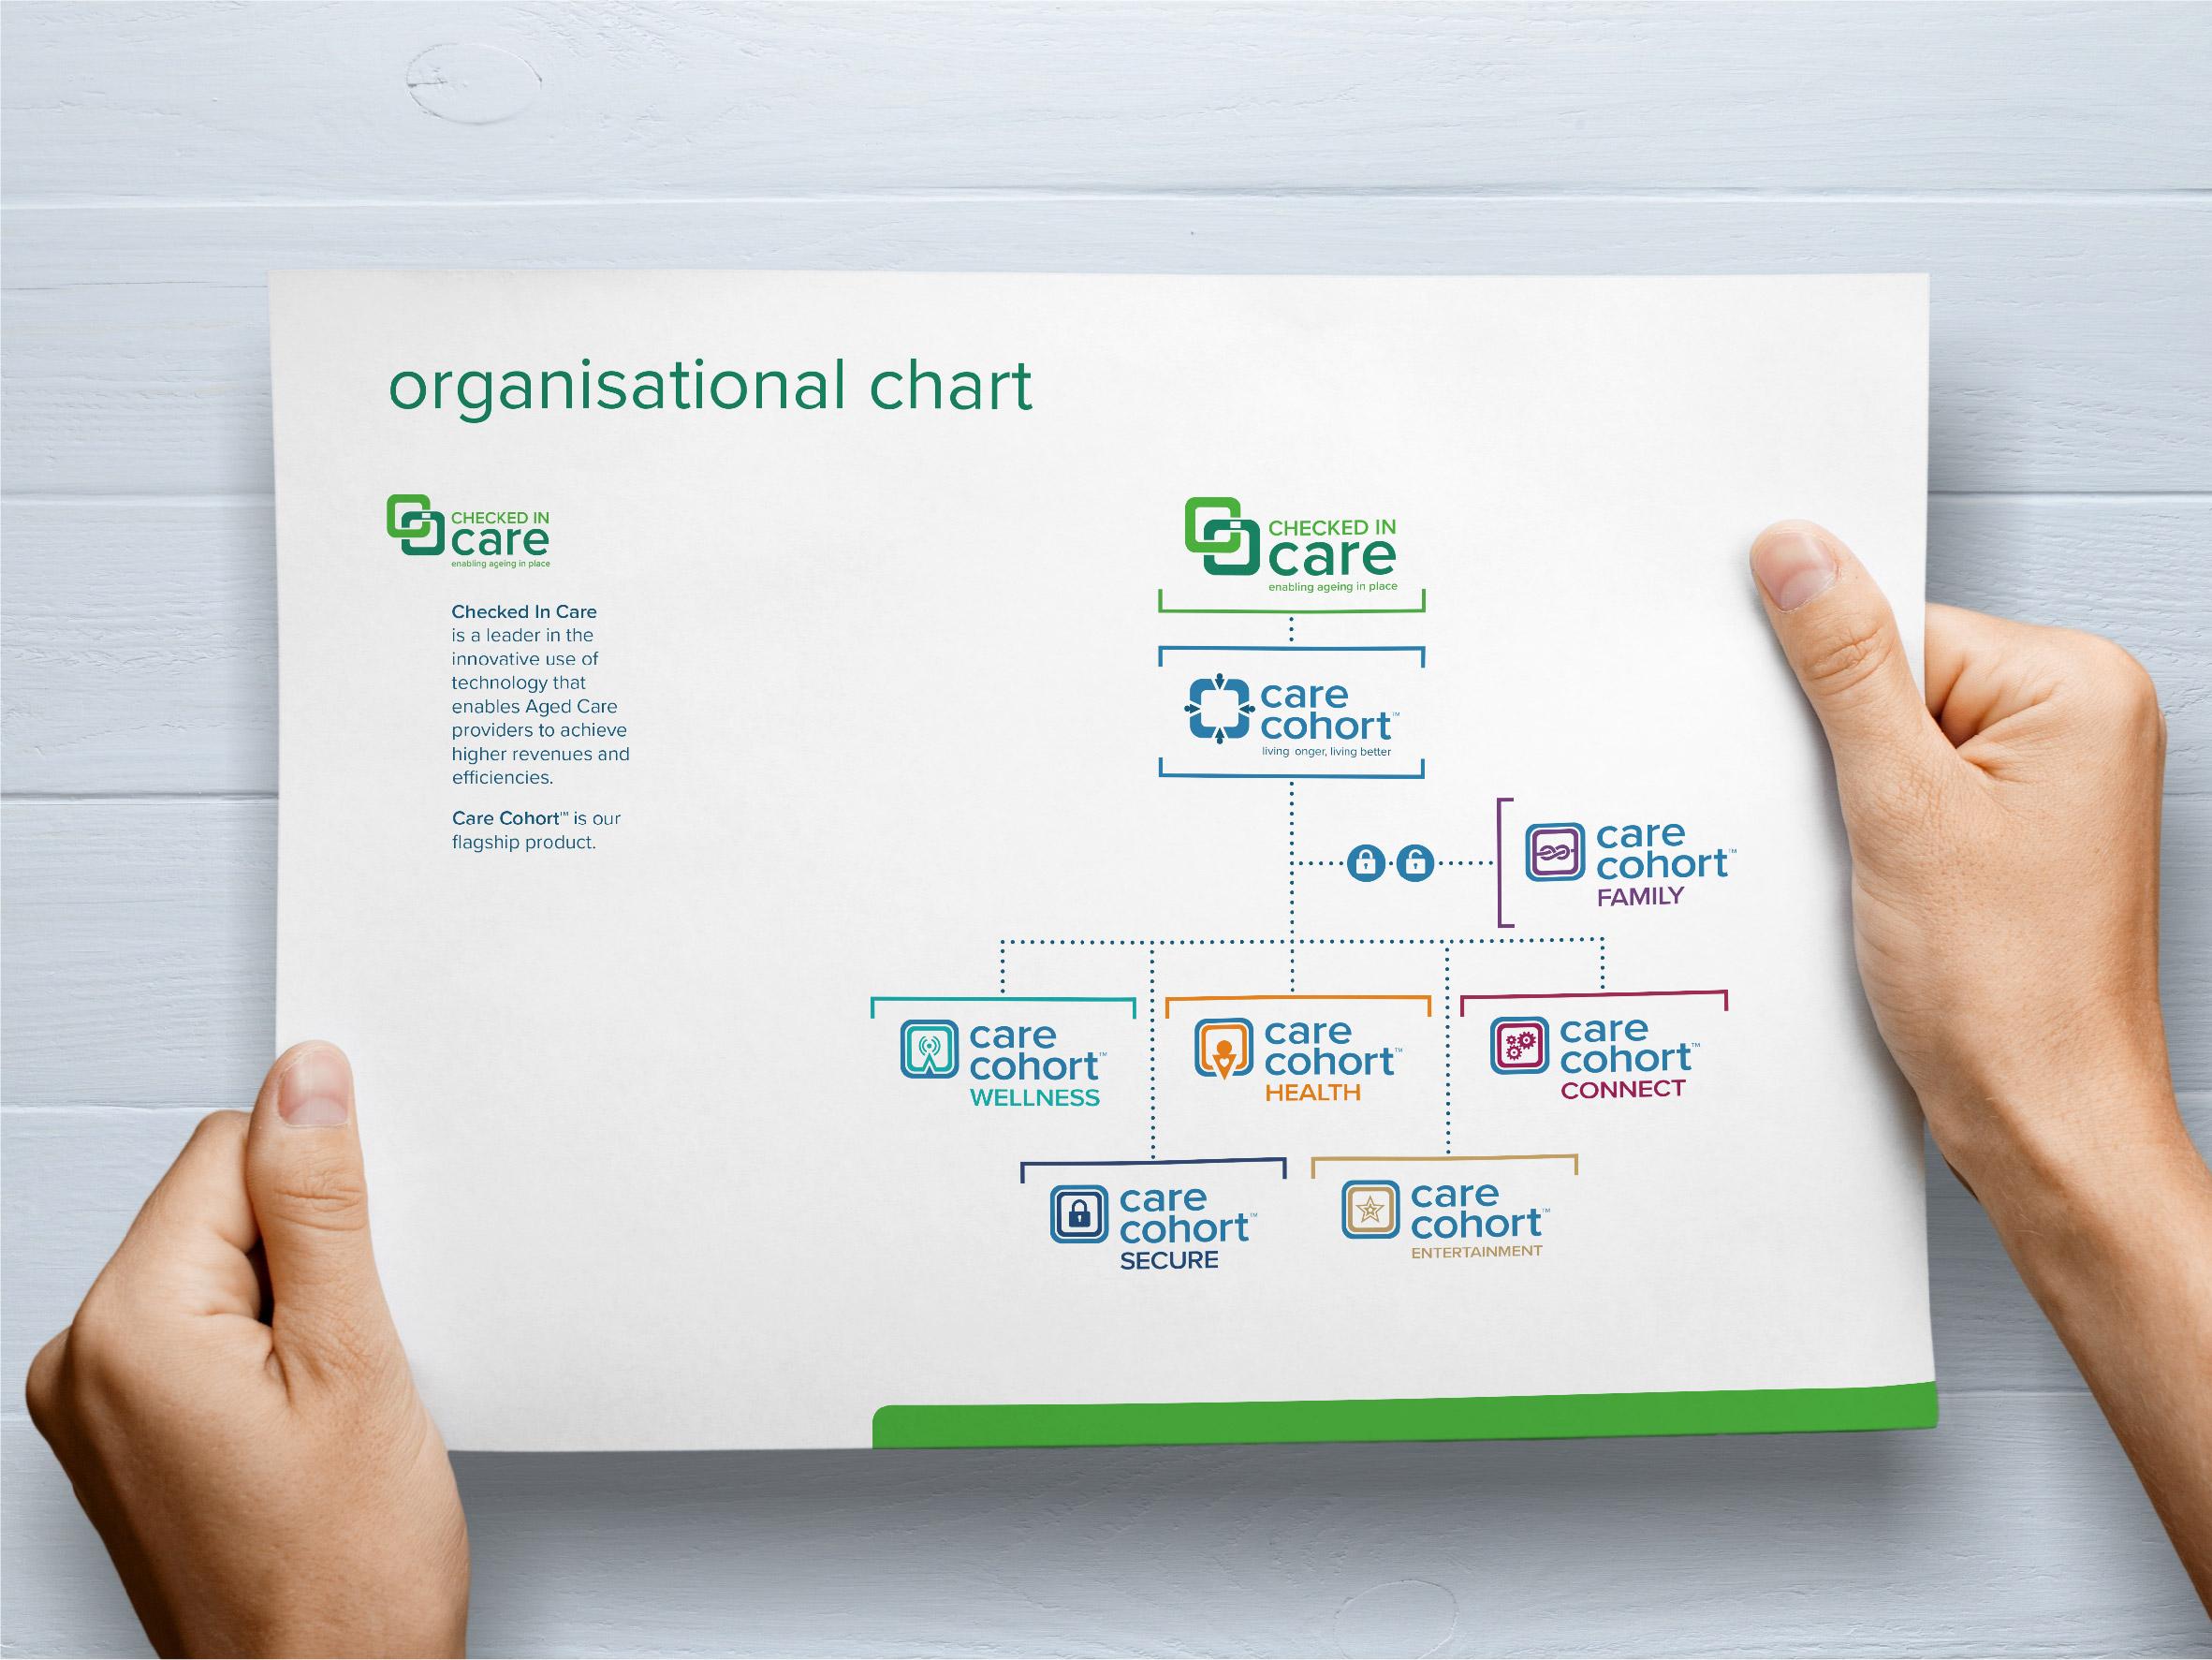 cic_organisational-chart